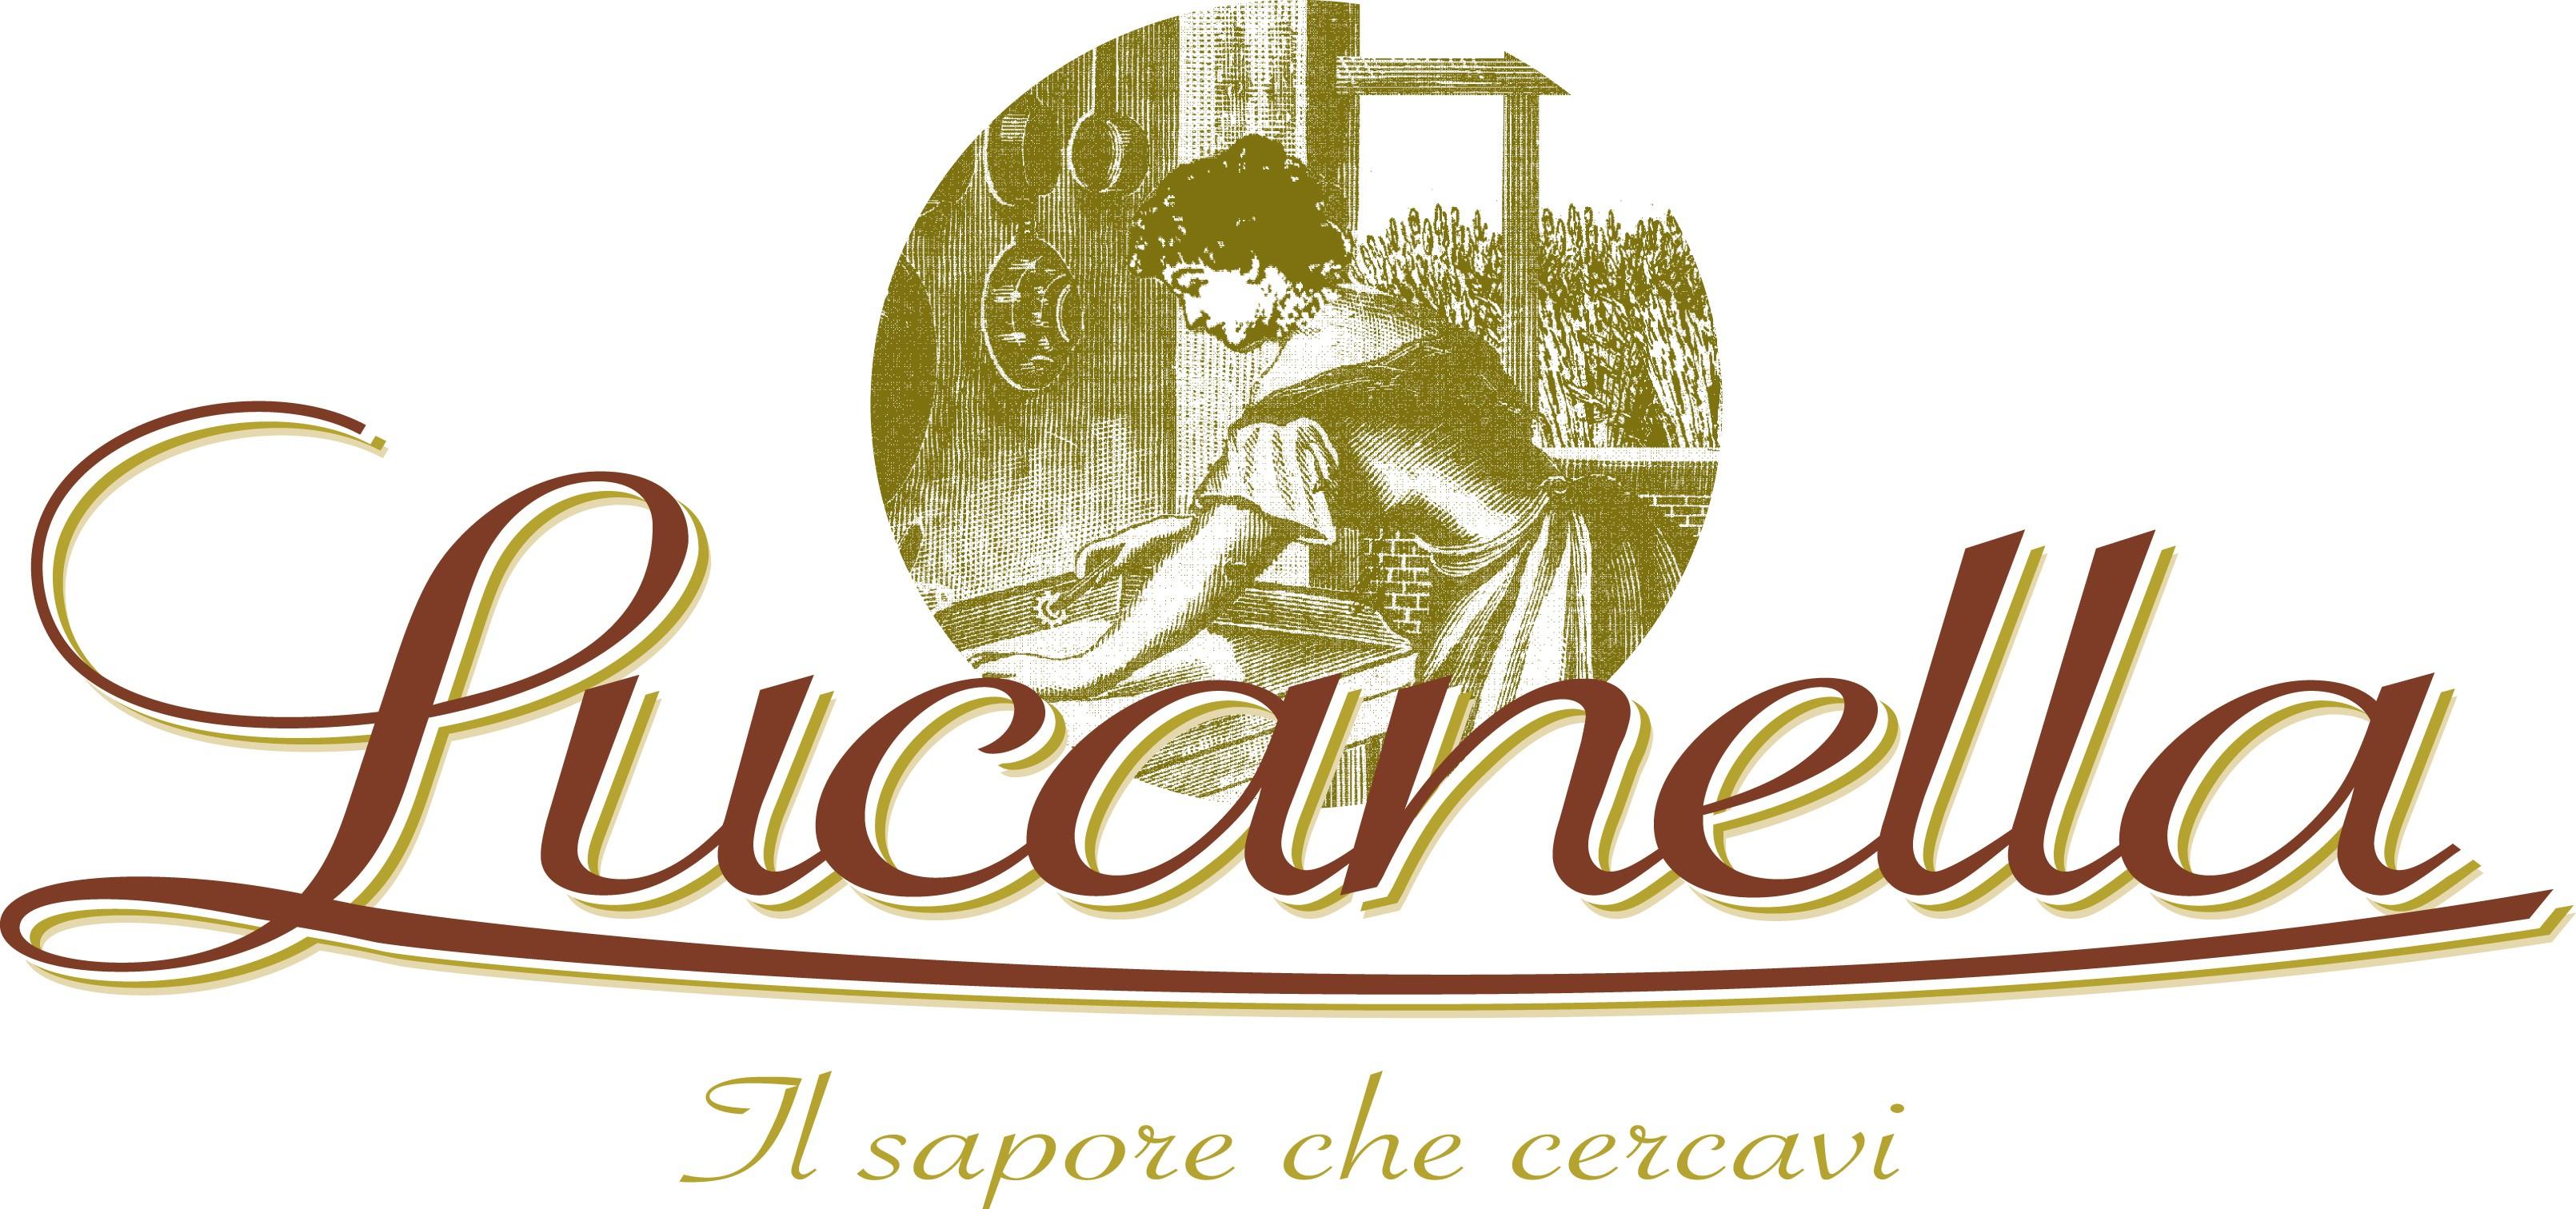 Lucanella